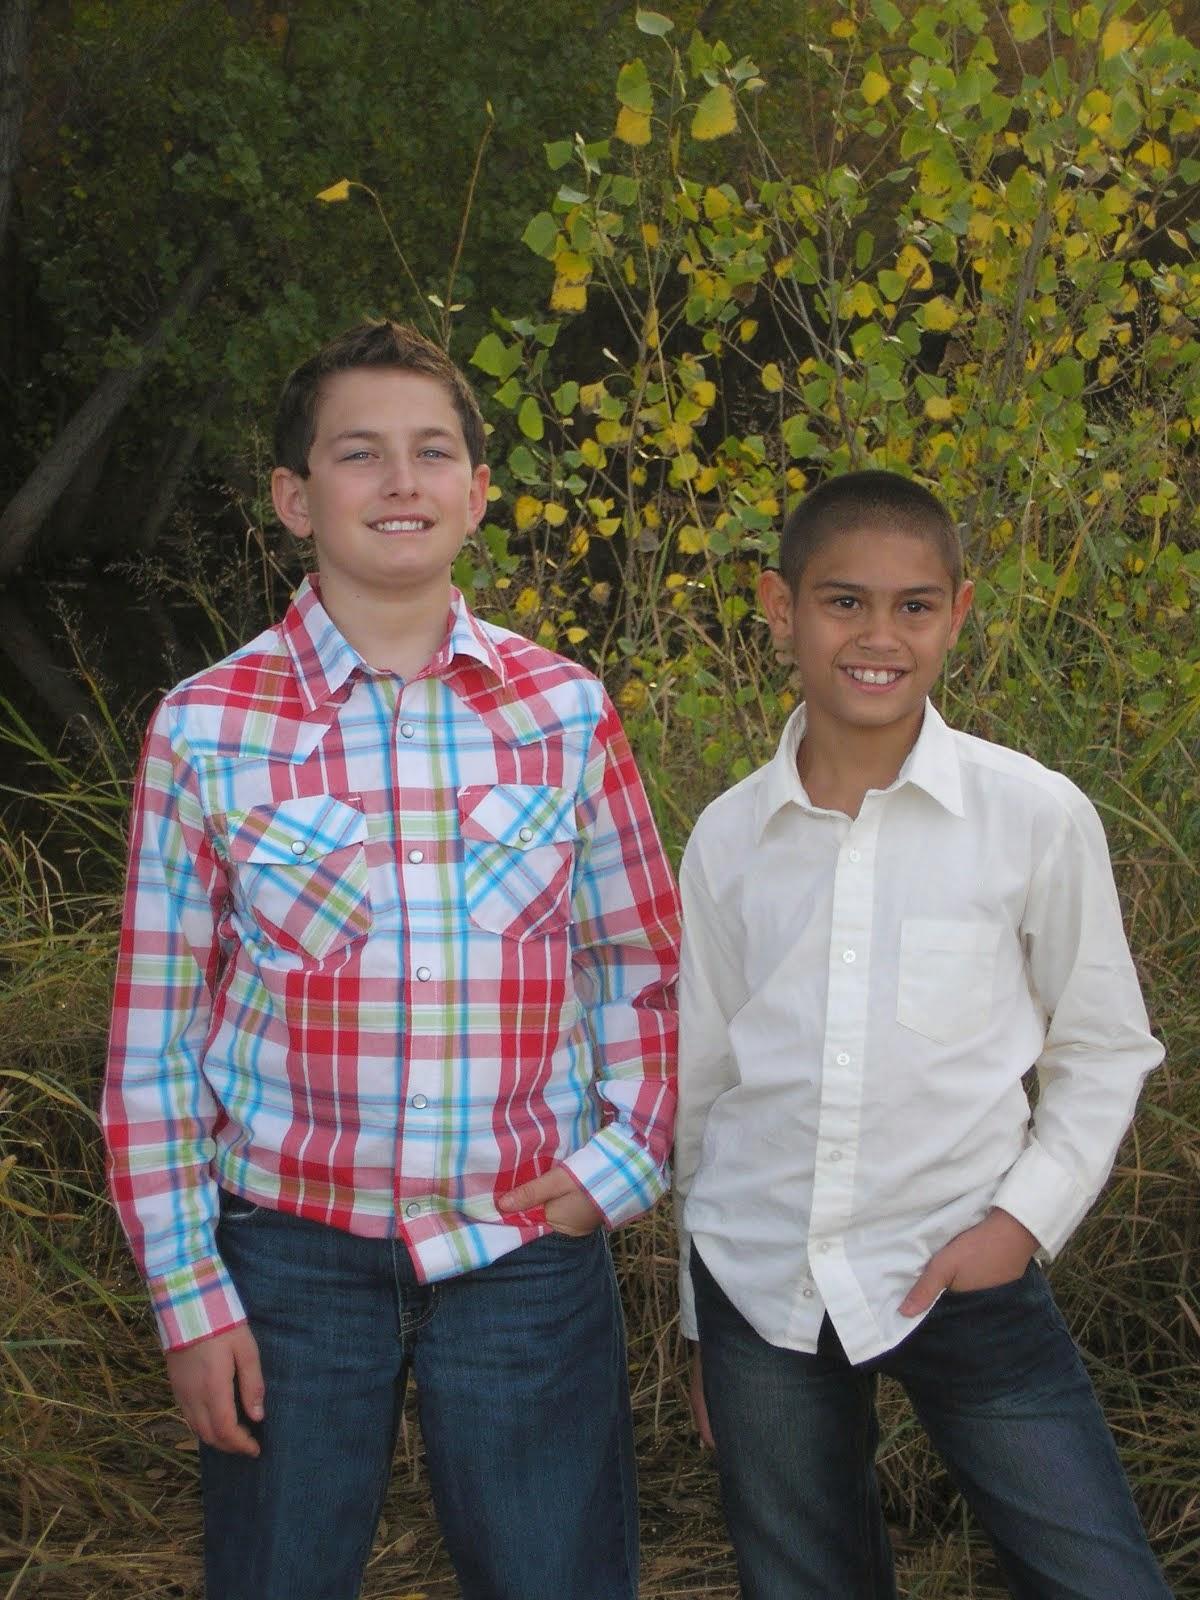 Trent and Kole